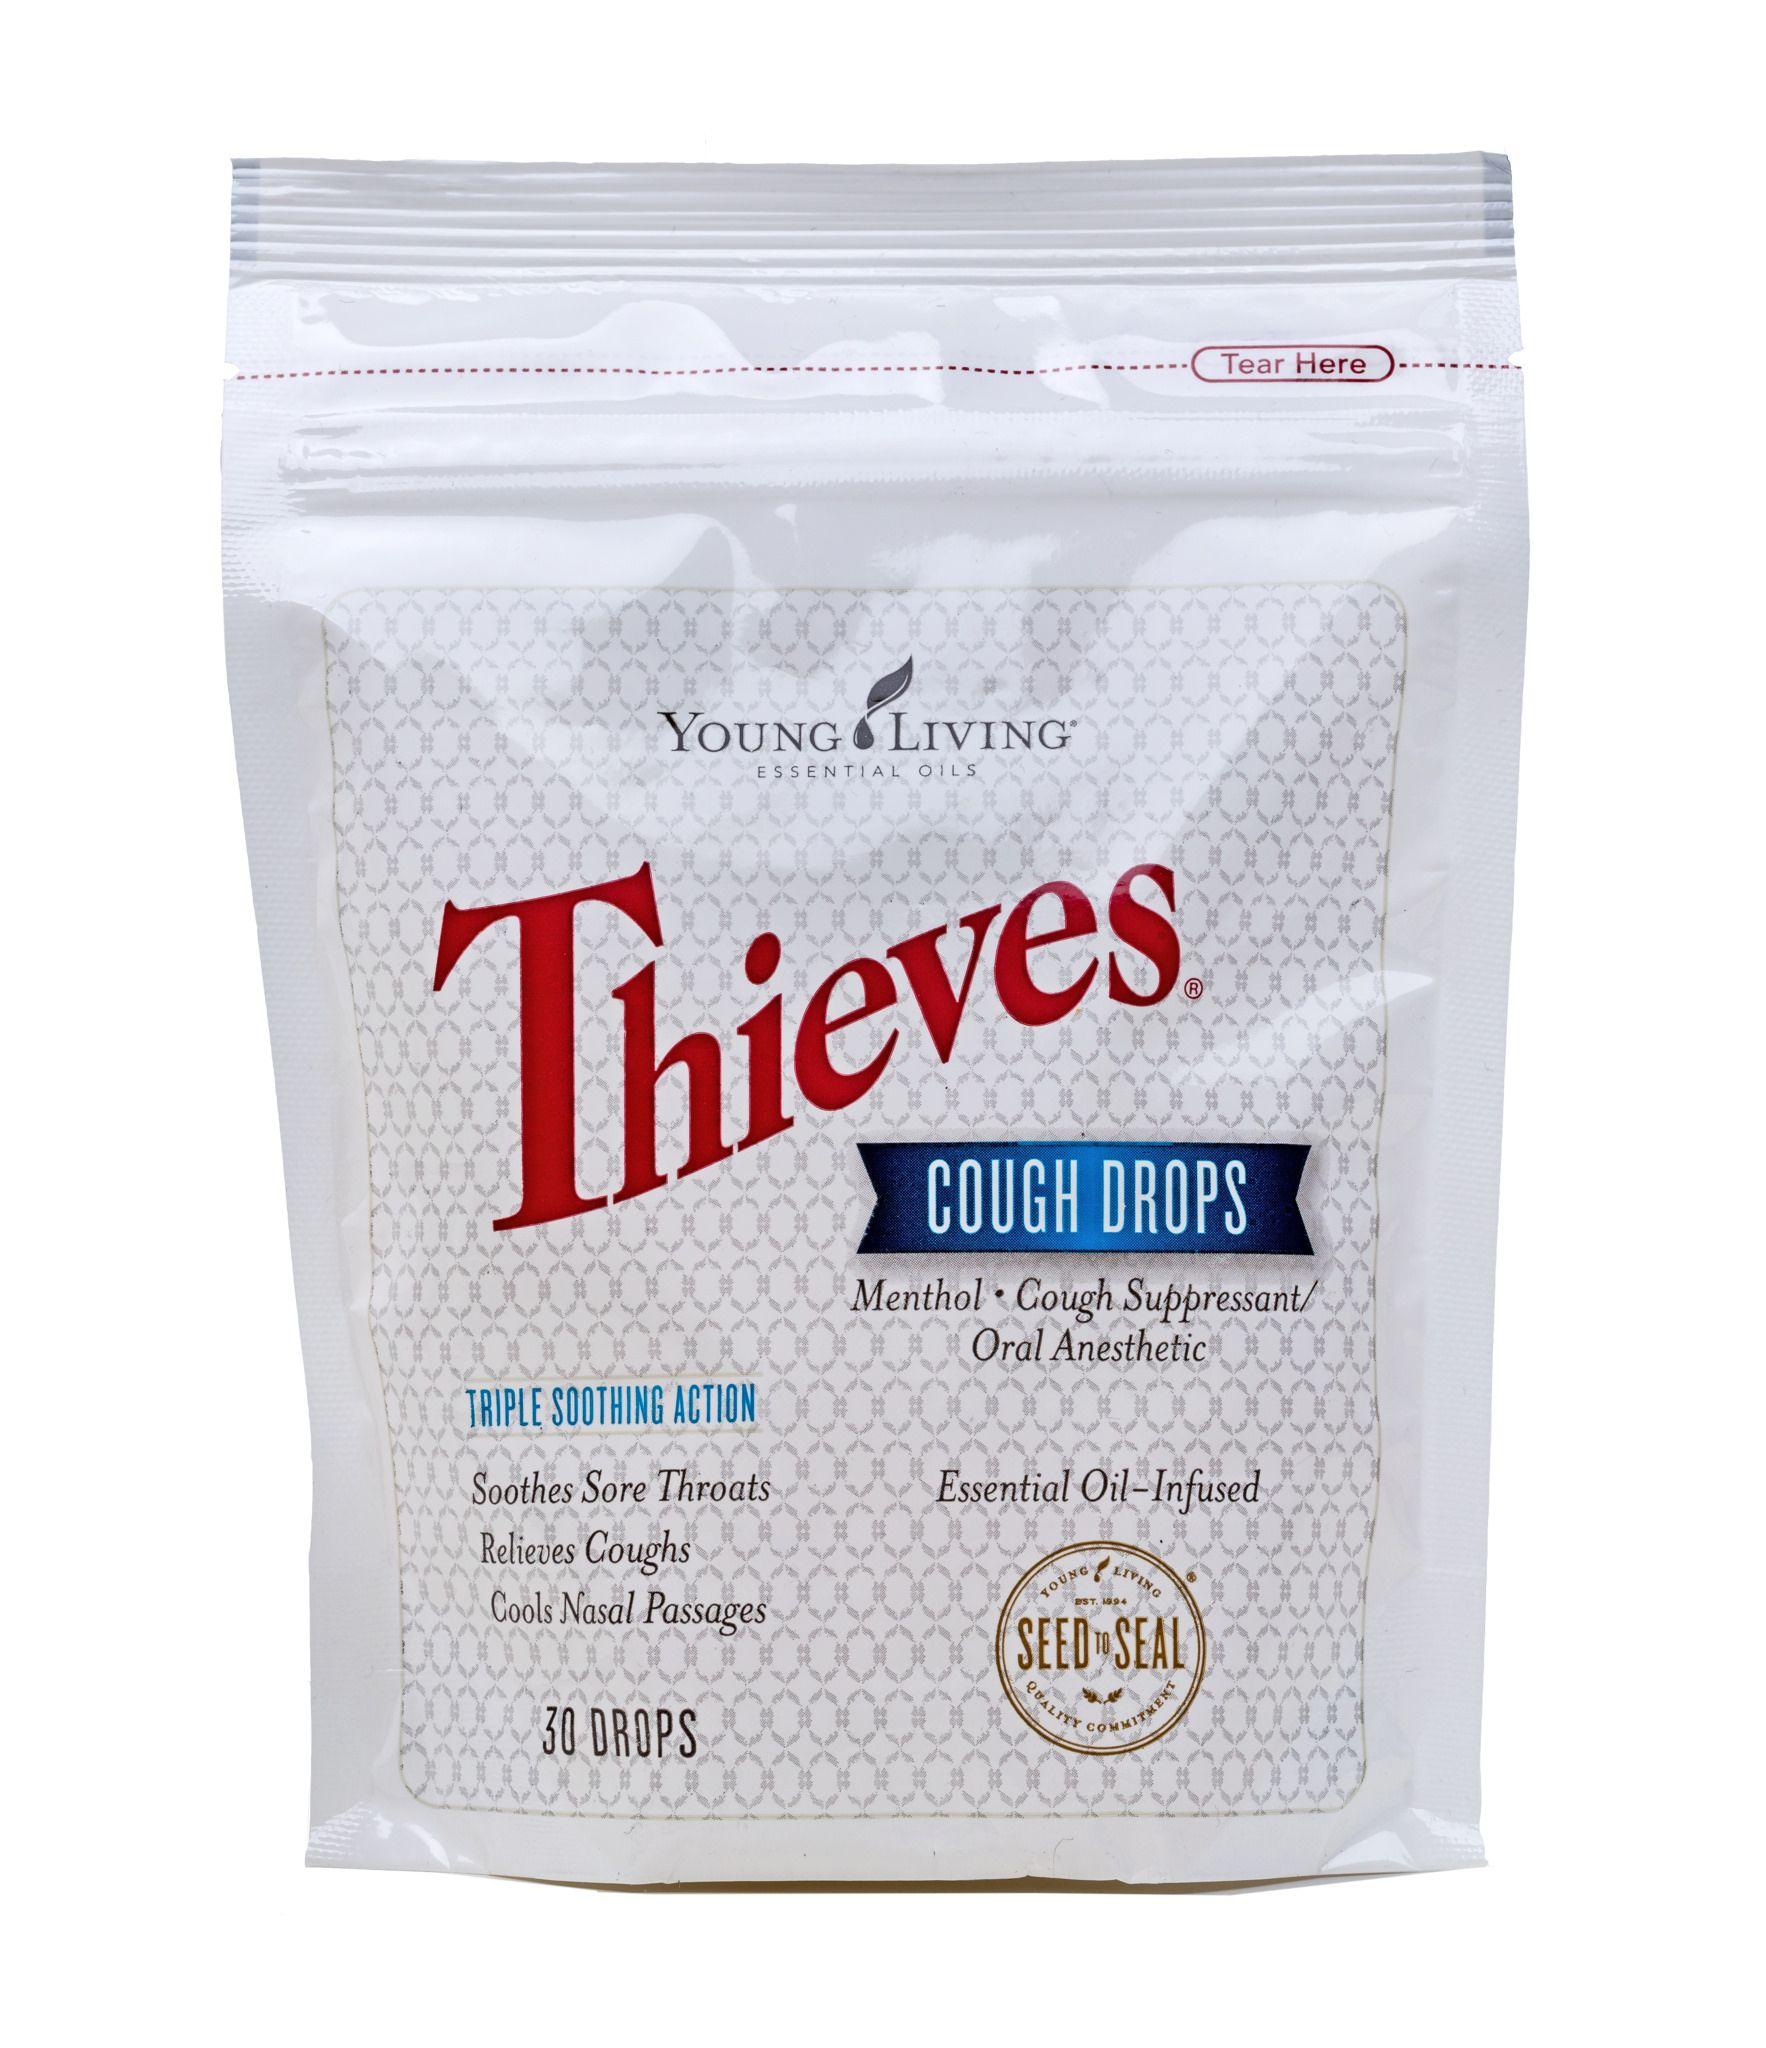 Thieves cough drop